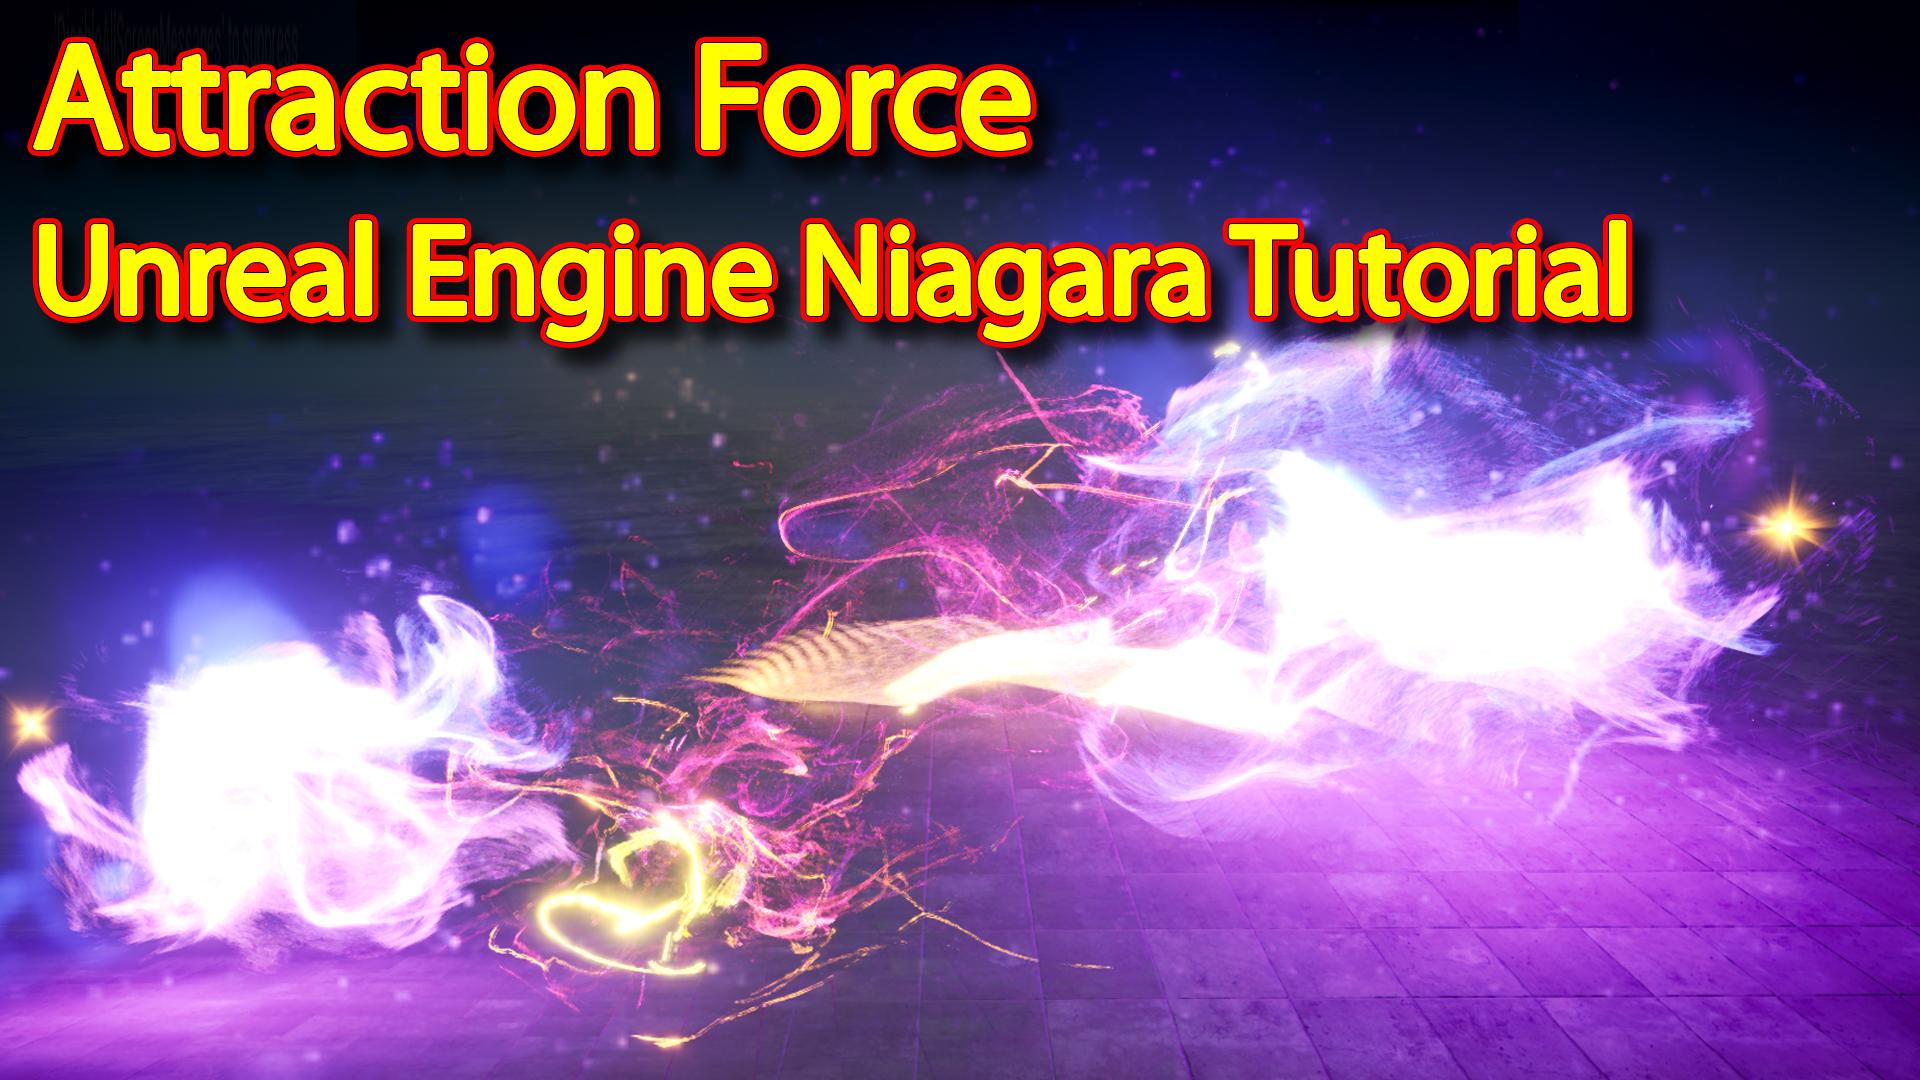 Unreal Engine Niagara Tutorial | Attraction Force